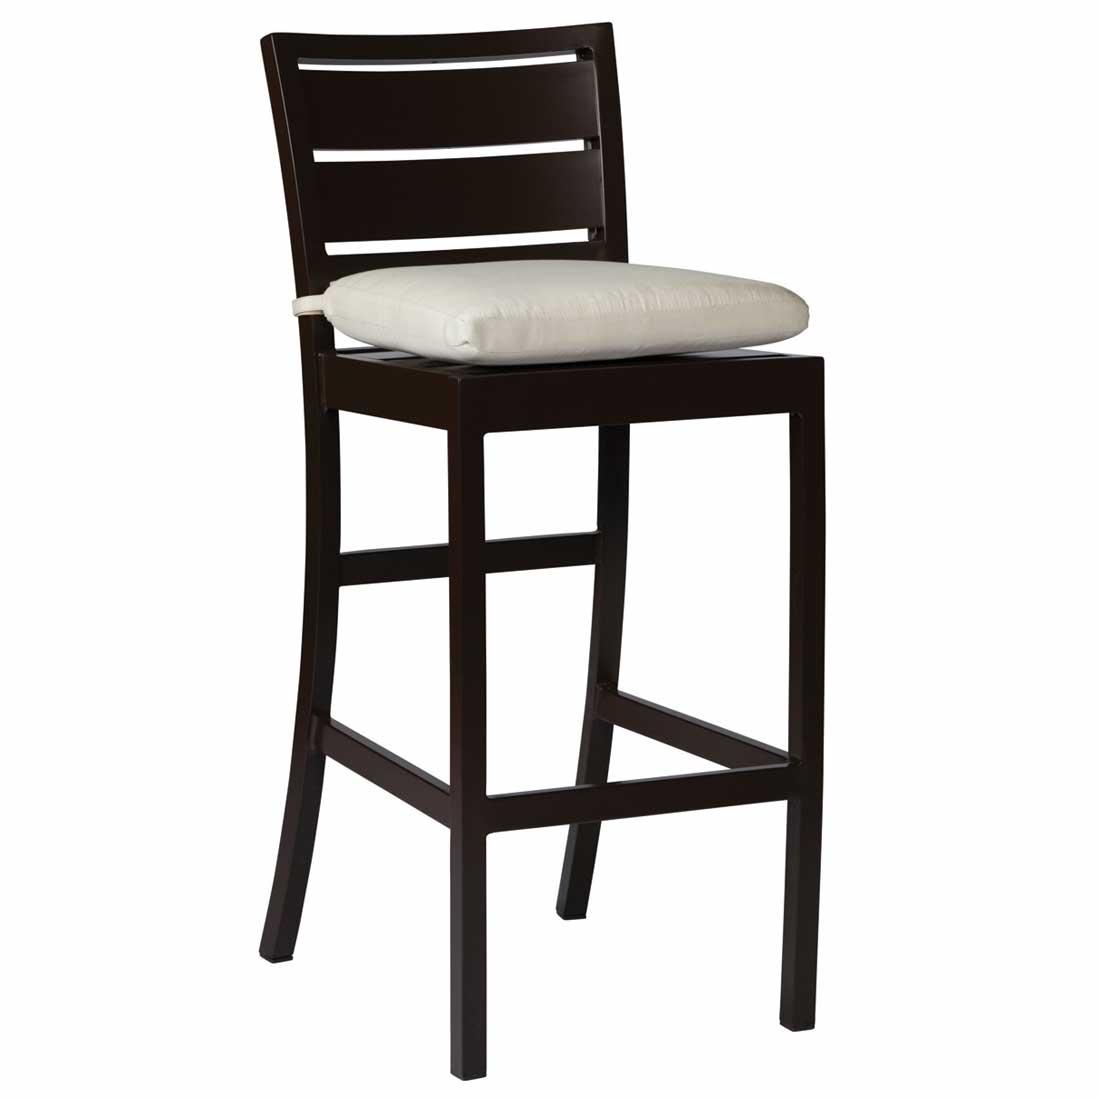 "Charleston Aluminum 30"" bar stool - Dimensions: W18 D21 H44"